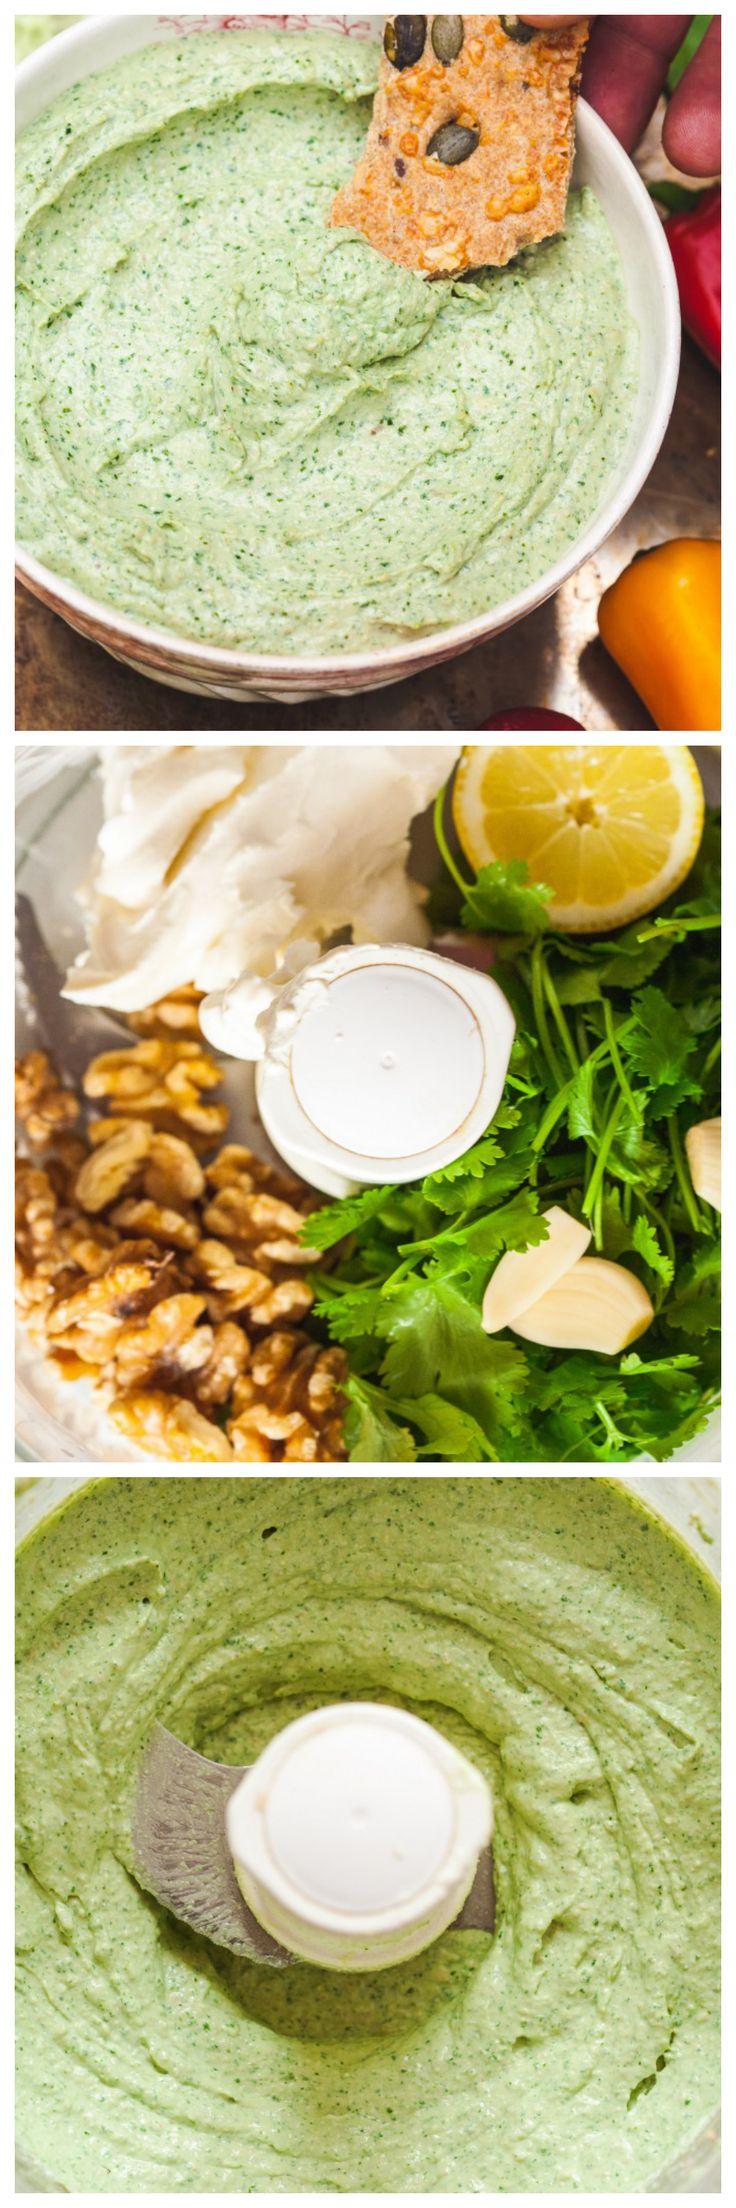 Creamy Cilantro and Walnut Dip